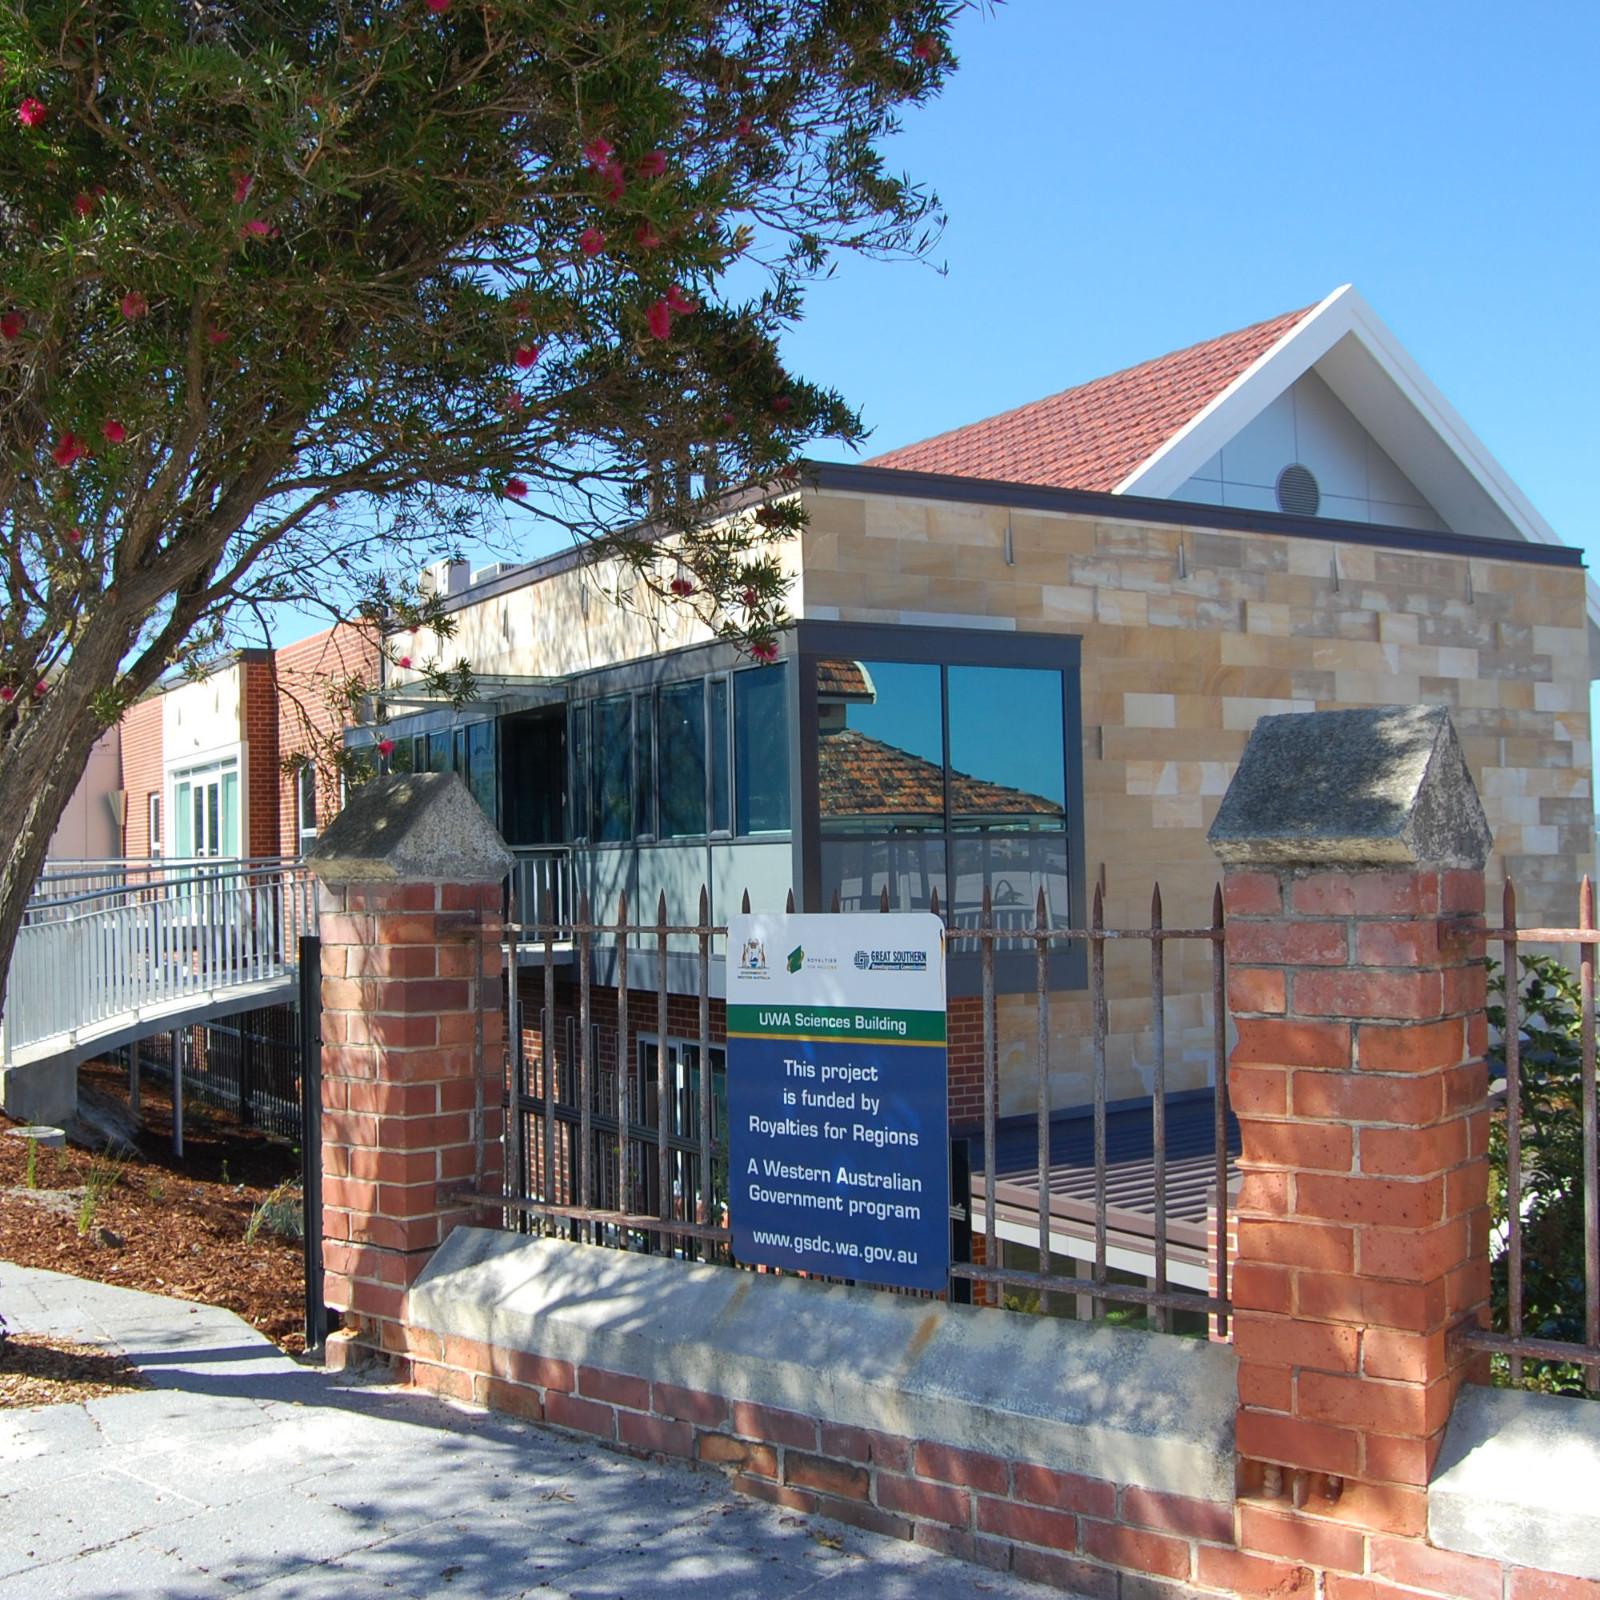 UWA Science Building